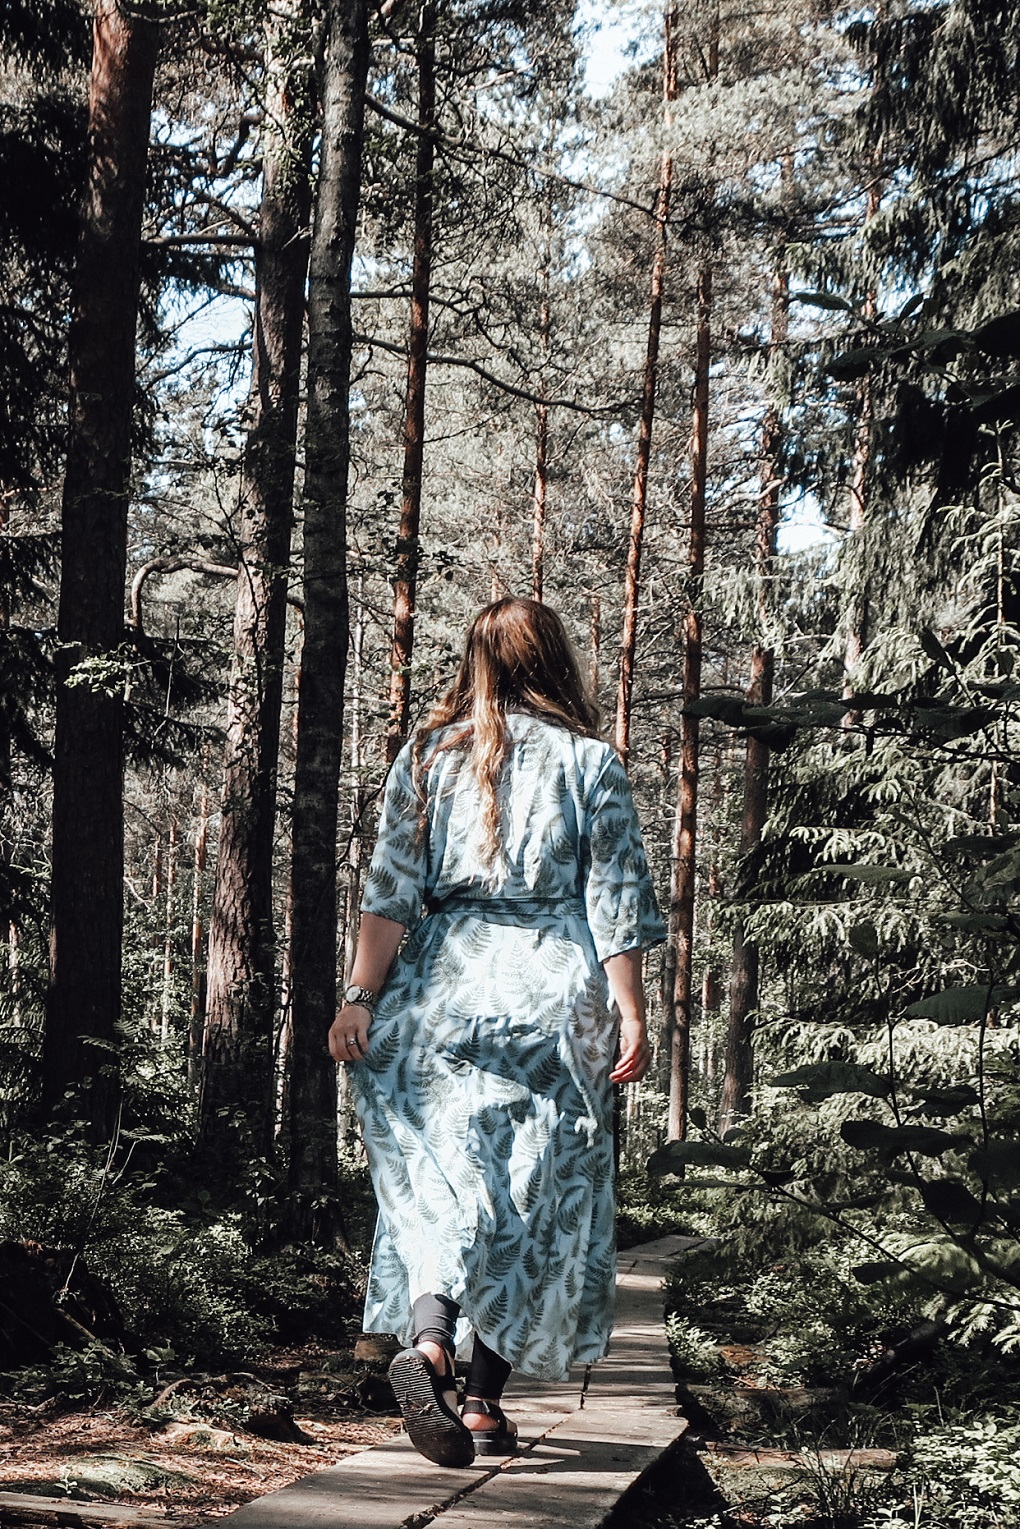 Introducing the perfect timeless dress for Nordic summer: Lili Marleena elisabeth rundlof